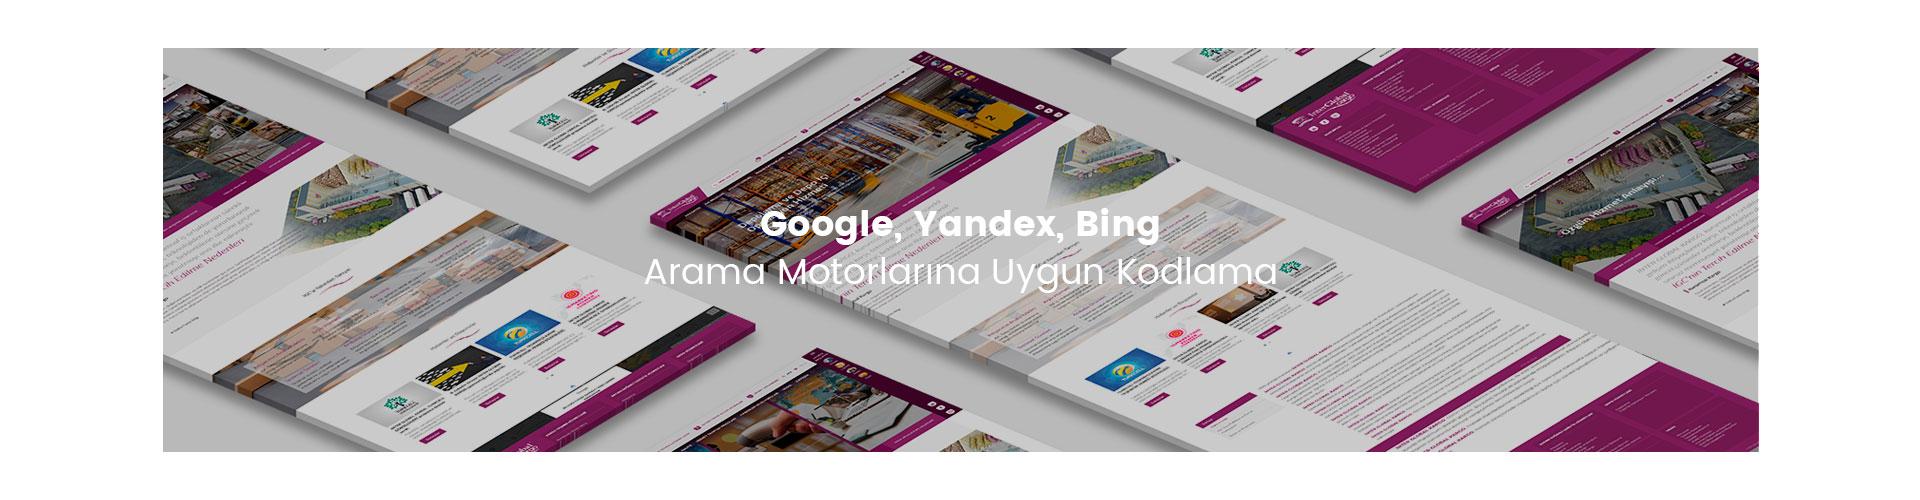 İnter Global Kargo Web Site Google